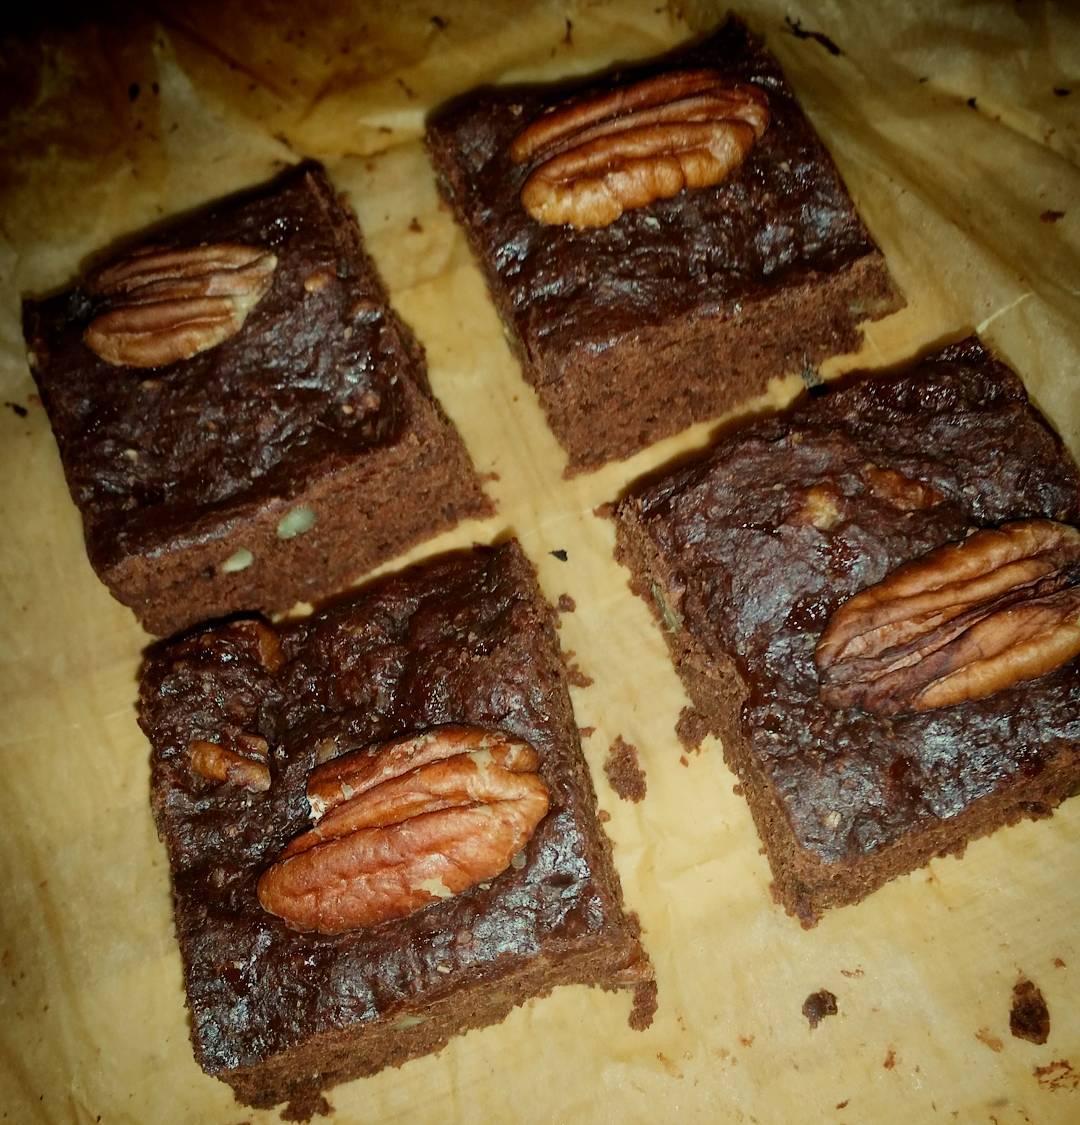 healthy one-bowl fudgy dark chocolate brownies by @cherinesbusyoven